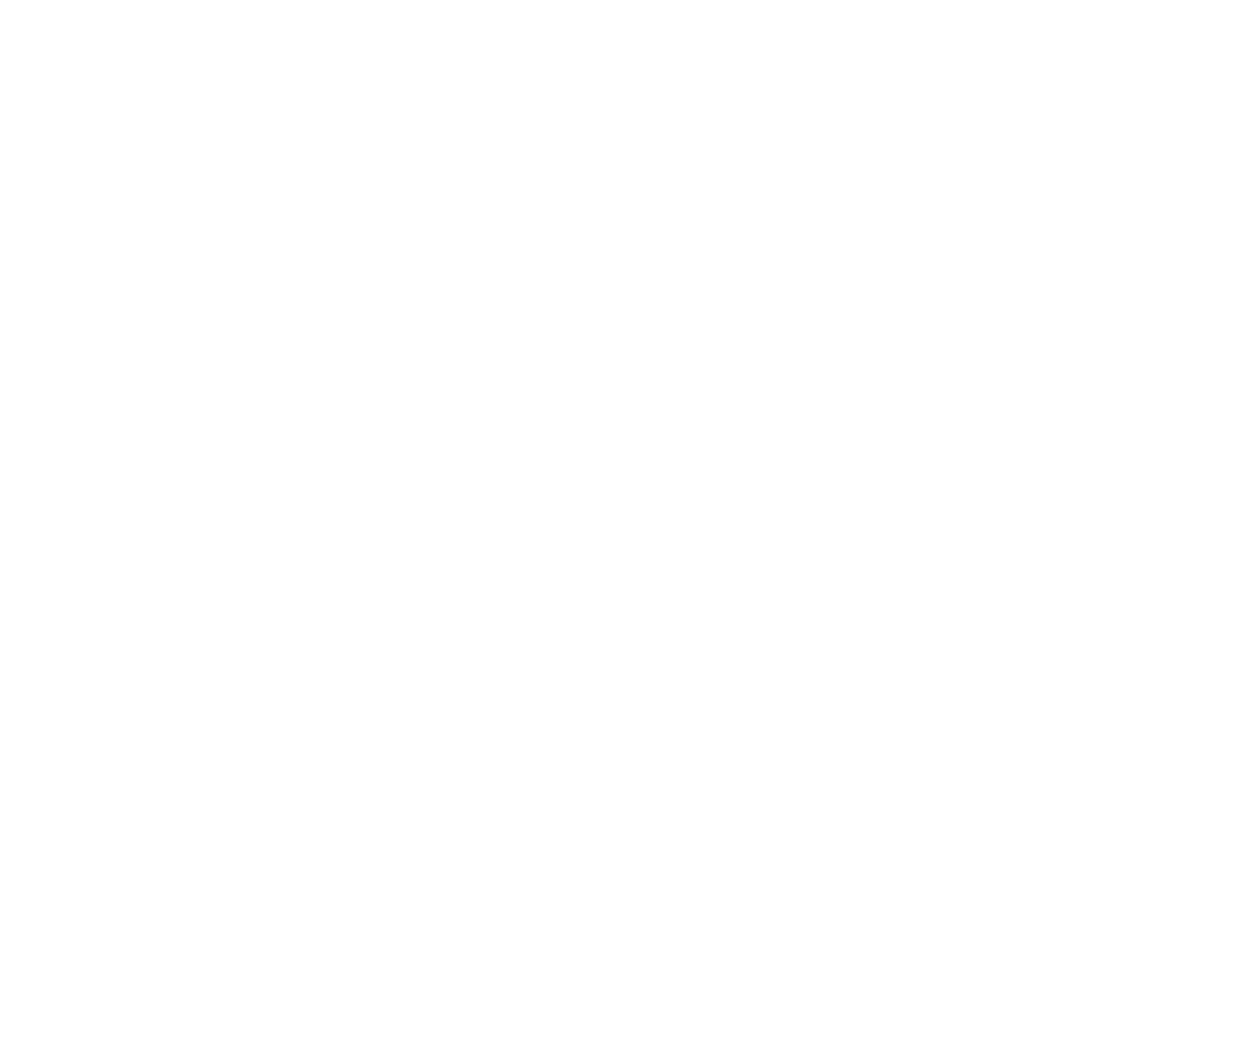 https://timsliquors.com/wp-content/uploads/2020/08/Tim_s-Liquors-White.png